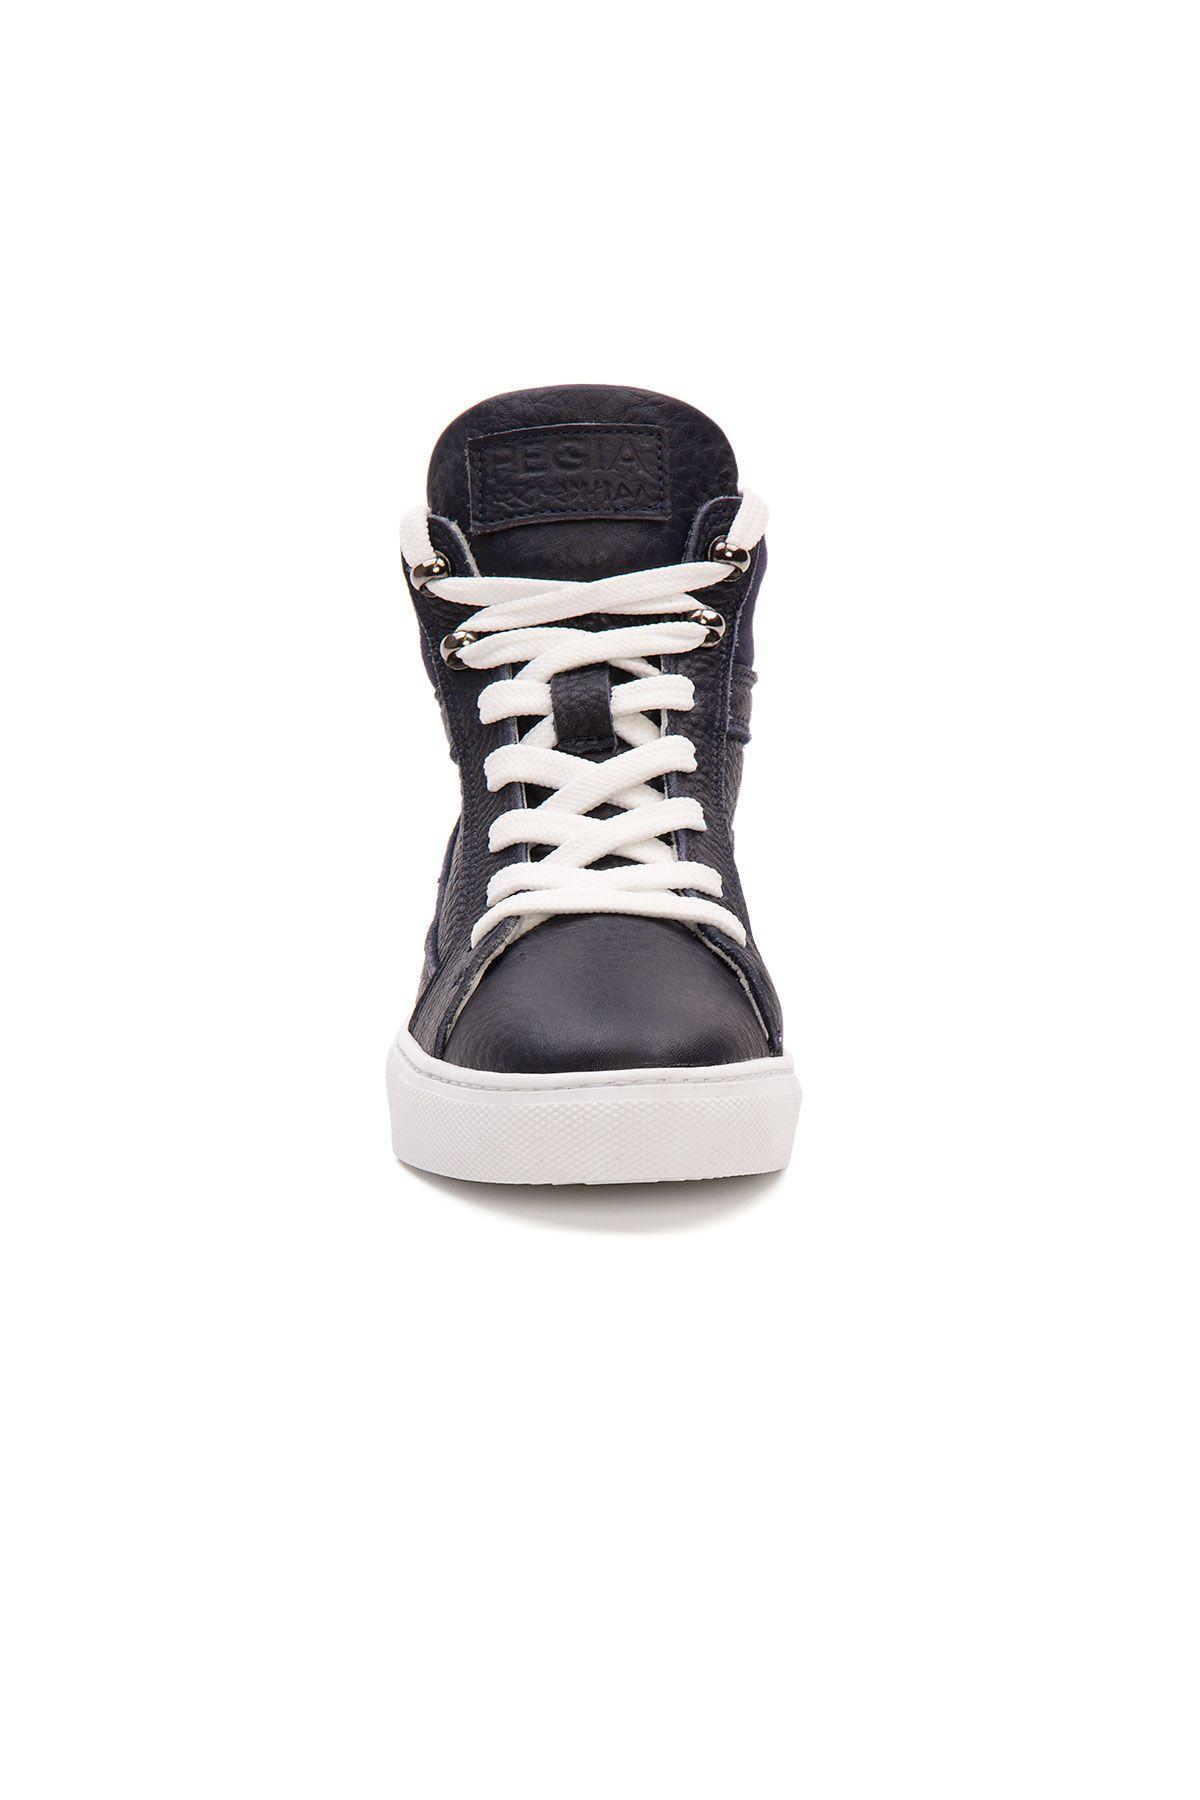 Pegia Genuine Leather Women's Sneaker LA1219 Navy blue